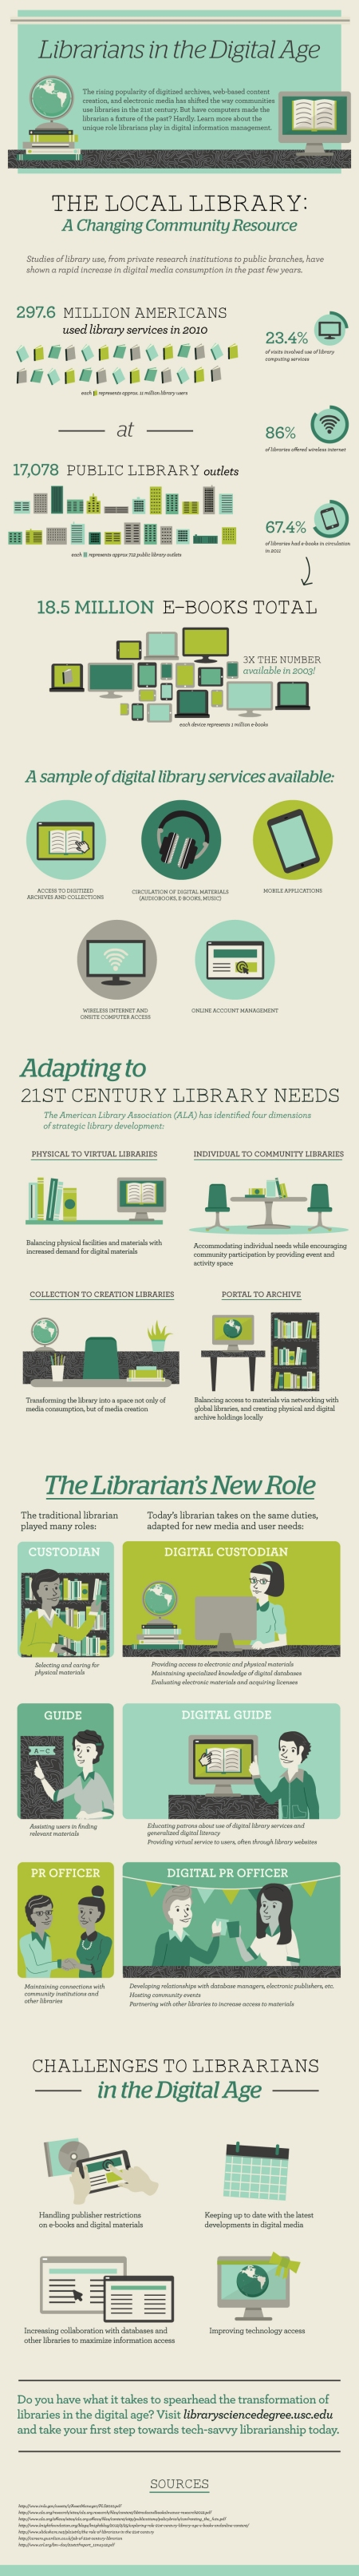 digital_librarians